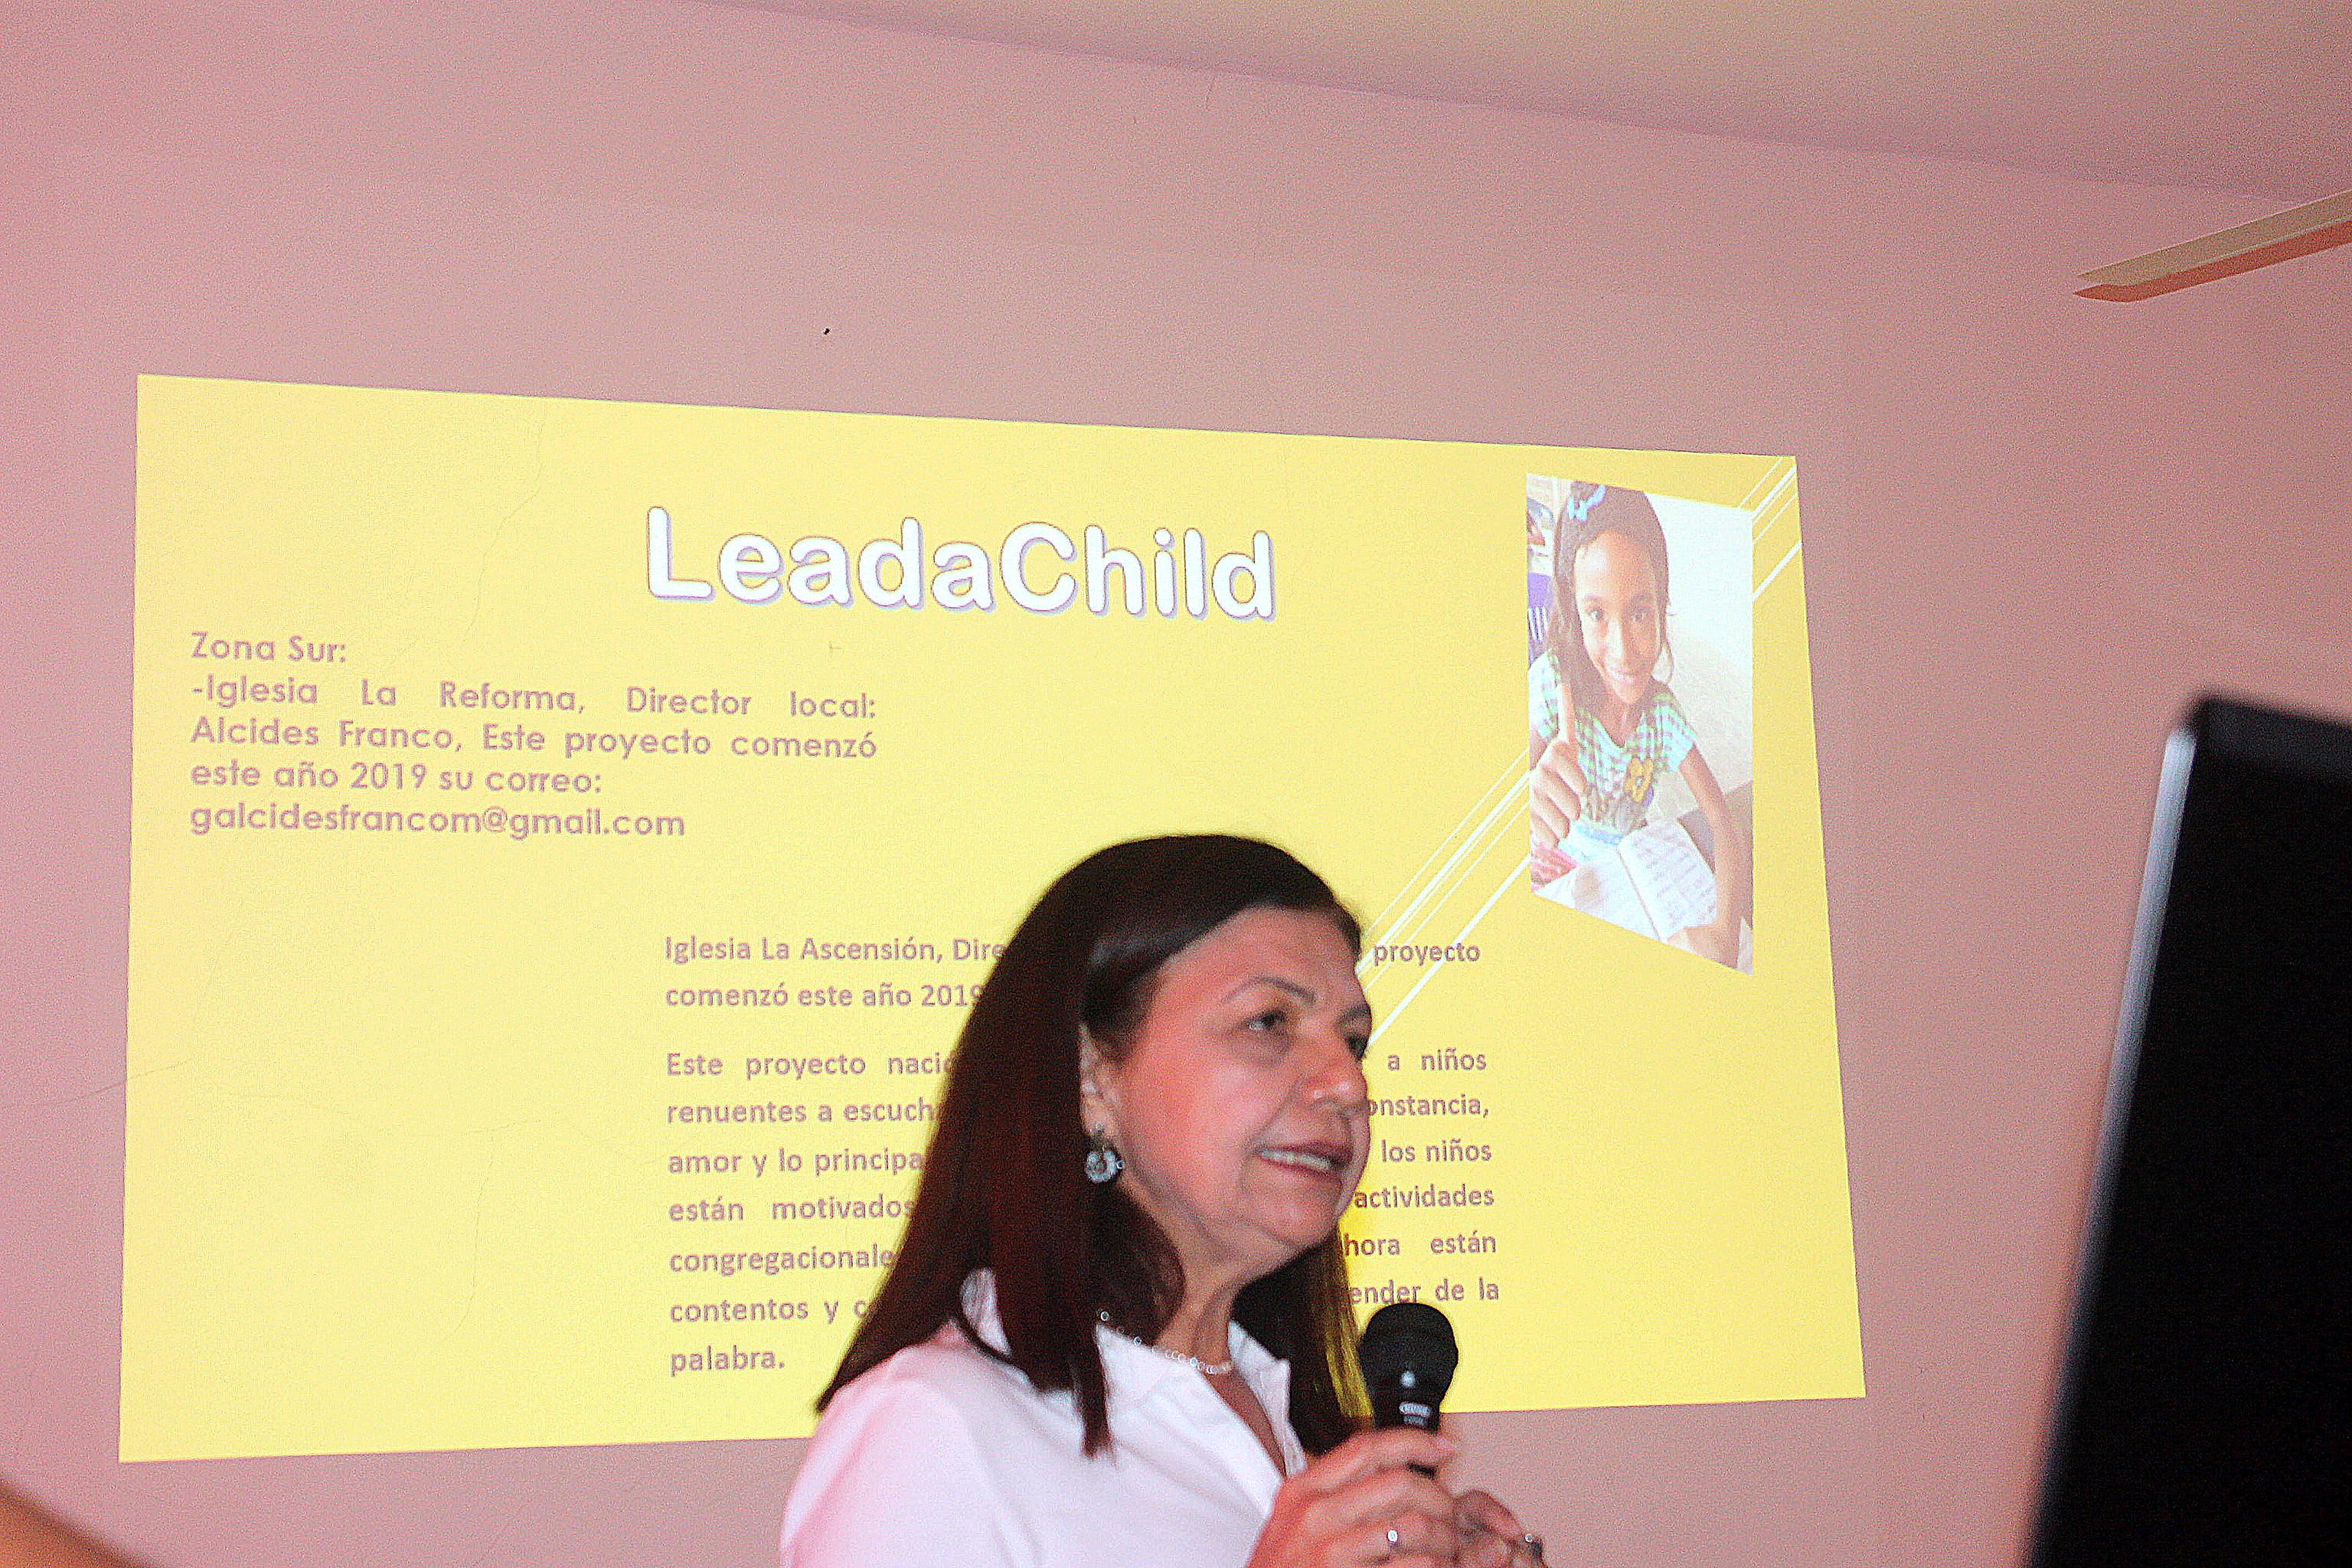 LeadaChild